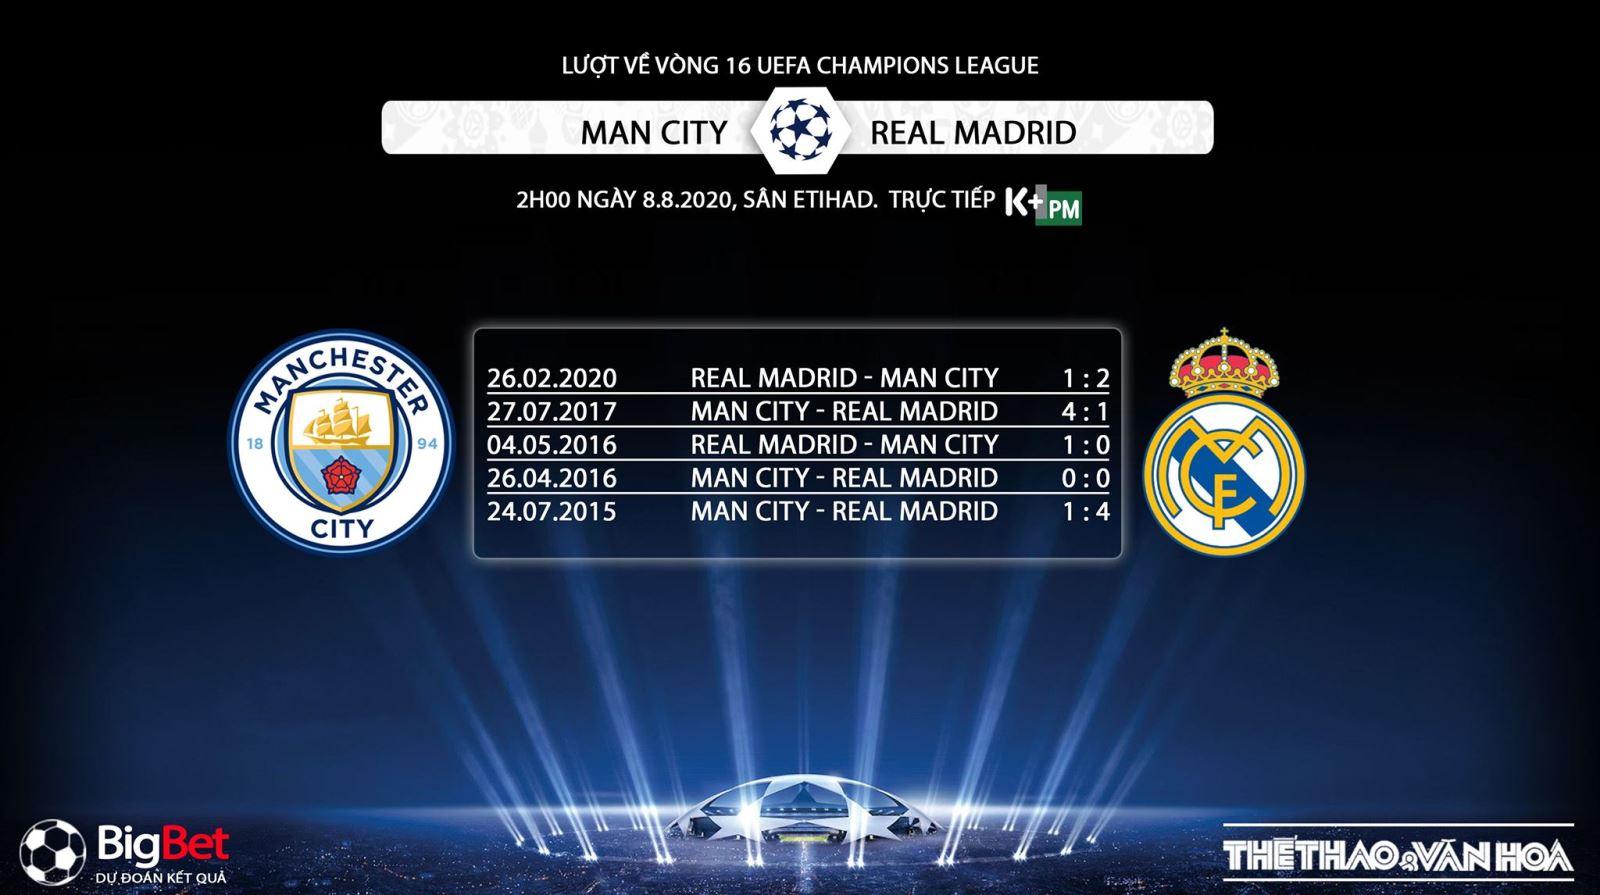 Man City vs Real Madrid, soi kèo Man City vs Real Madrid, trực tiếp bóng đá, trực tiếp Man City vs Real Madrid, nhận định Man City vs Real Madrid, dự đoán Man City vs Real Madrid